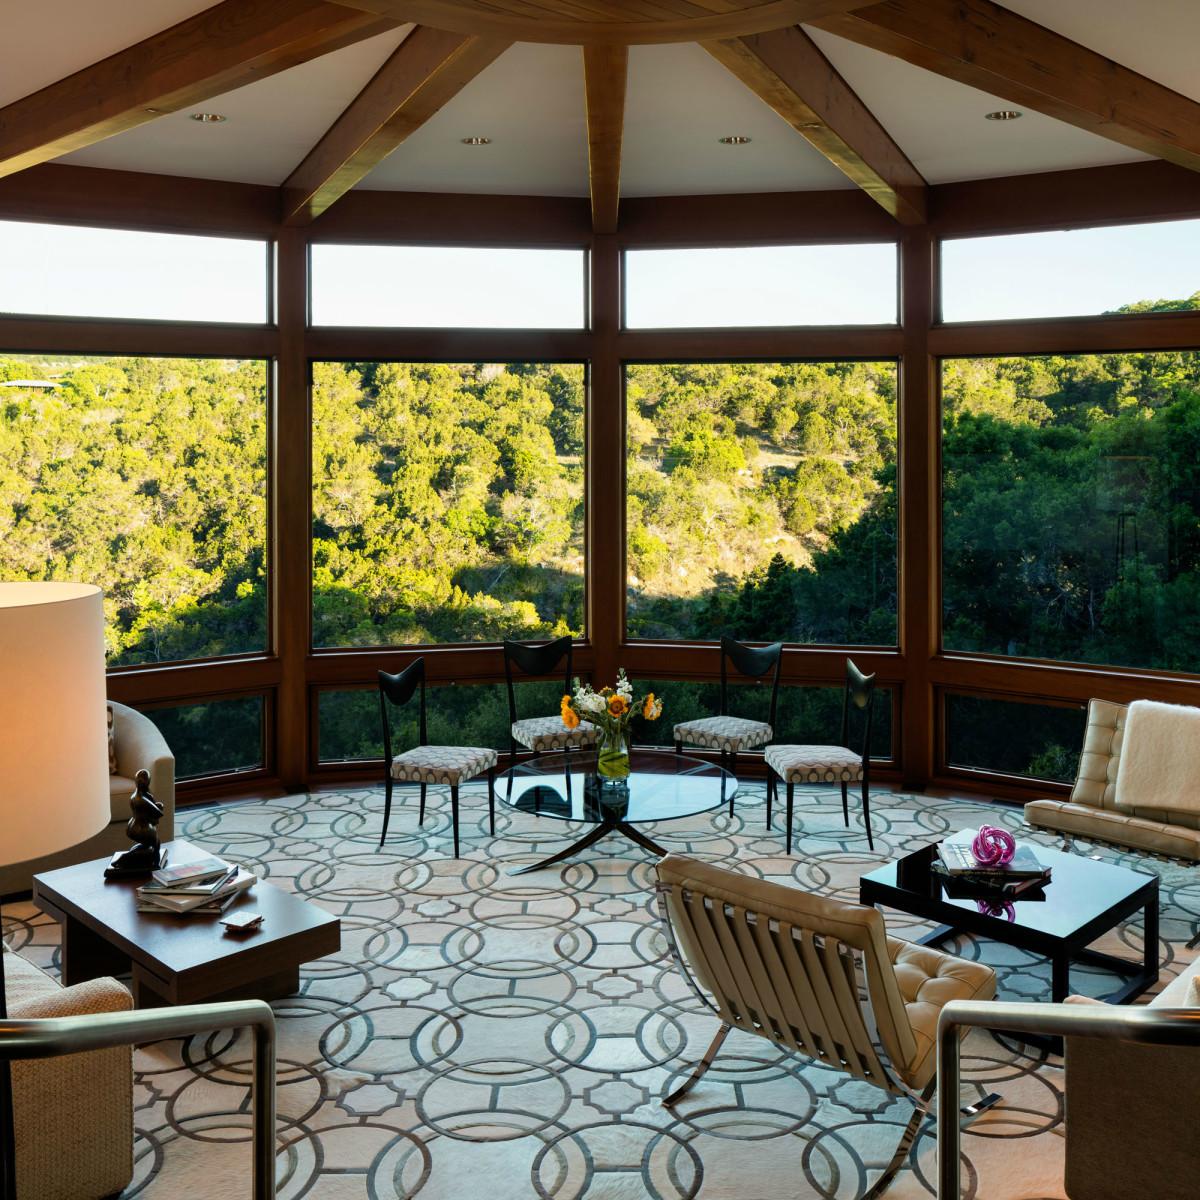 Austin house home 101 Pascal Lane Weslake Rob Roy neighborhood living room windows view